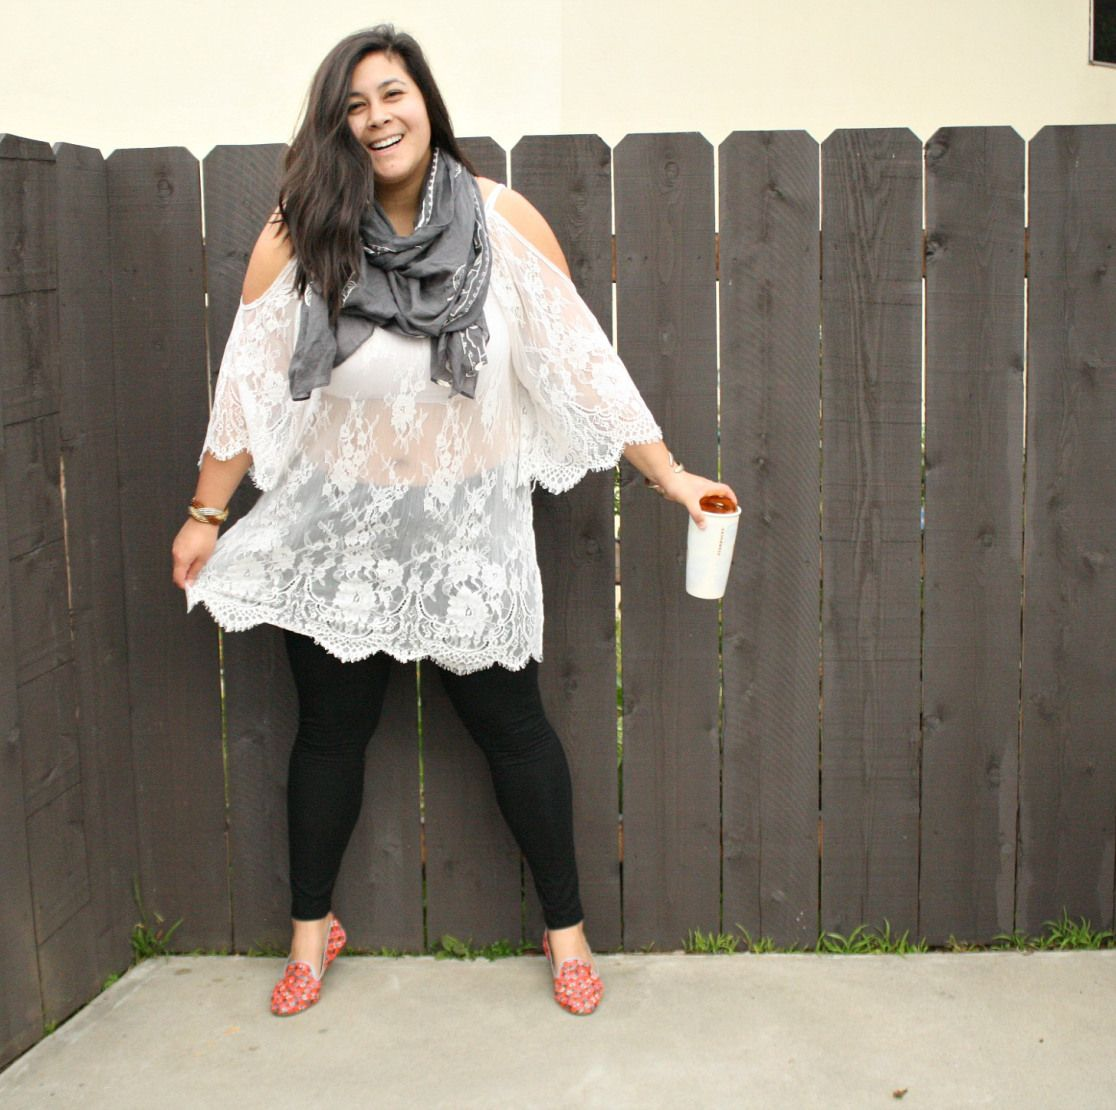 Sheer mini lace dress and leggings; OOTD | Lace dress, Bohemian ...